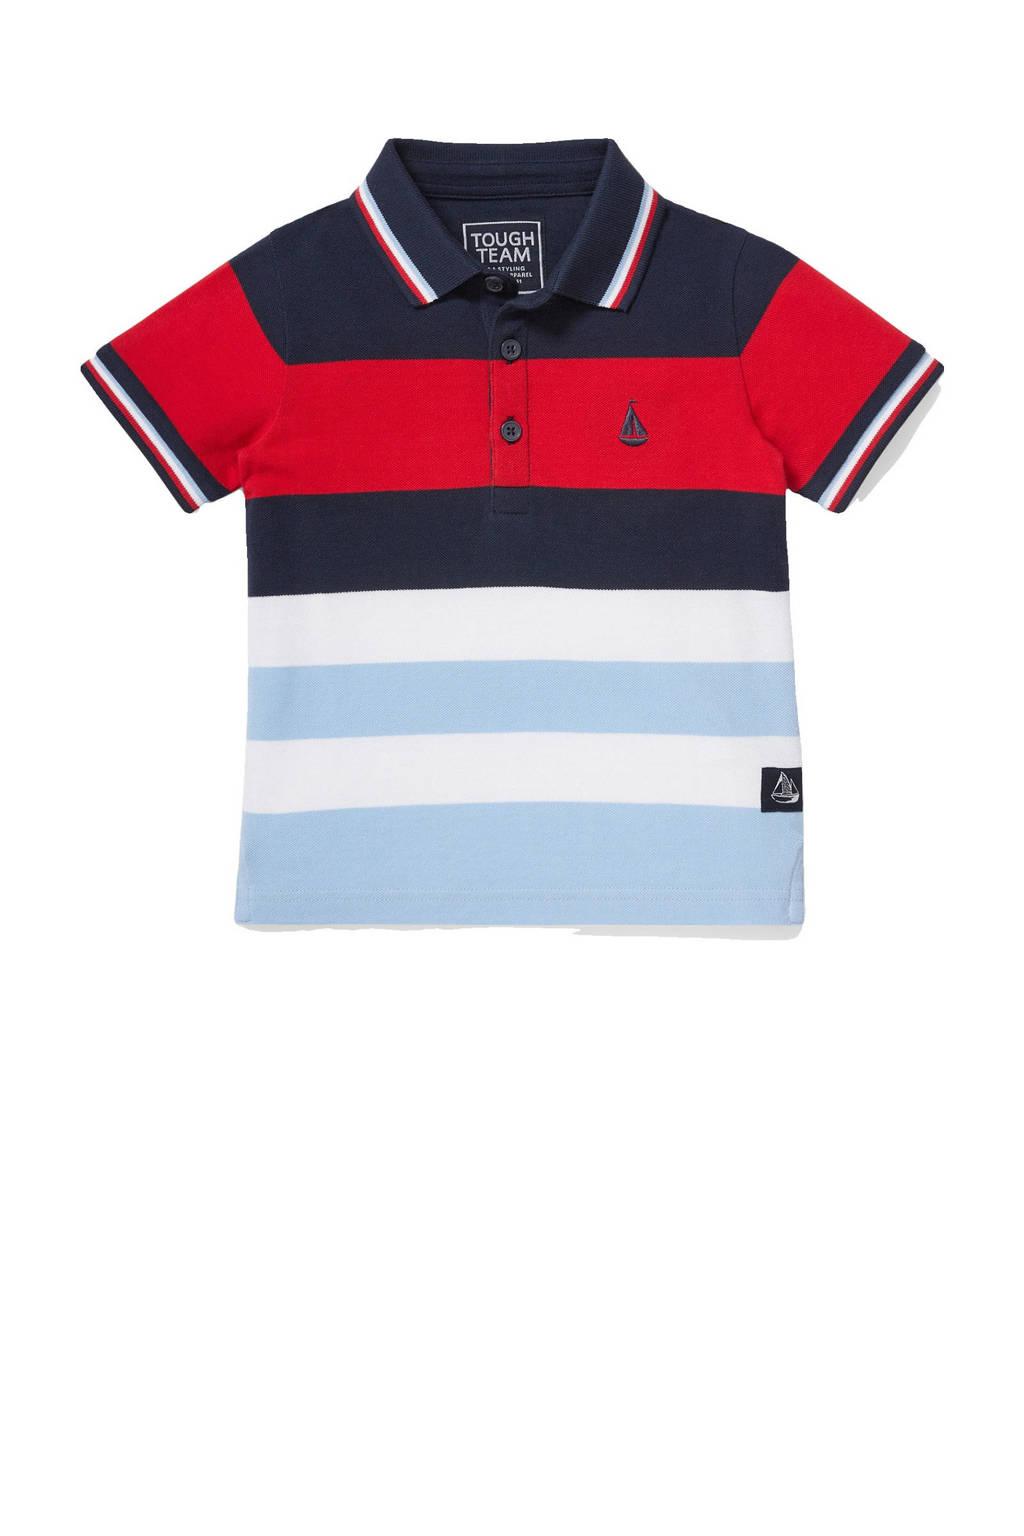 C&A Tough Team gestreepte polo donkerblauw/rood/lichtblauw